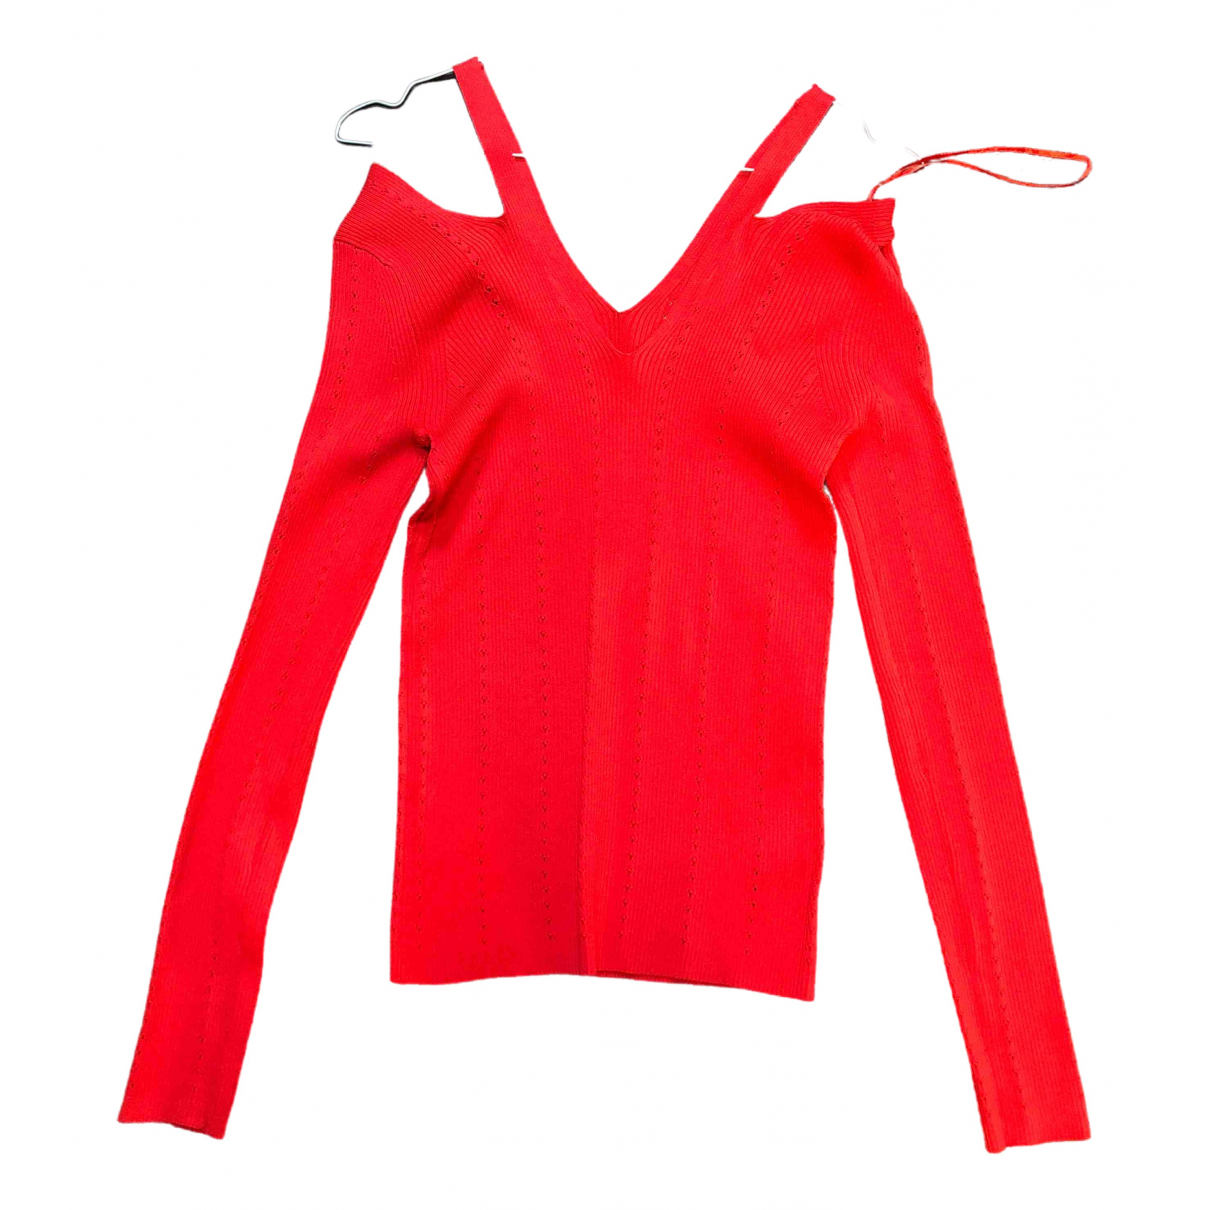 Sandro \N Red Knitwear for Women 1 US